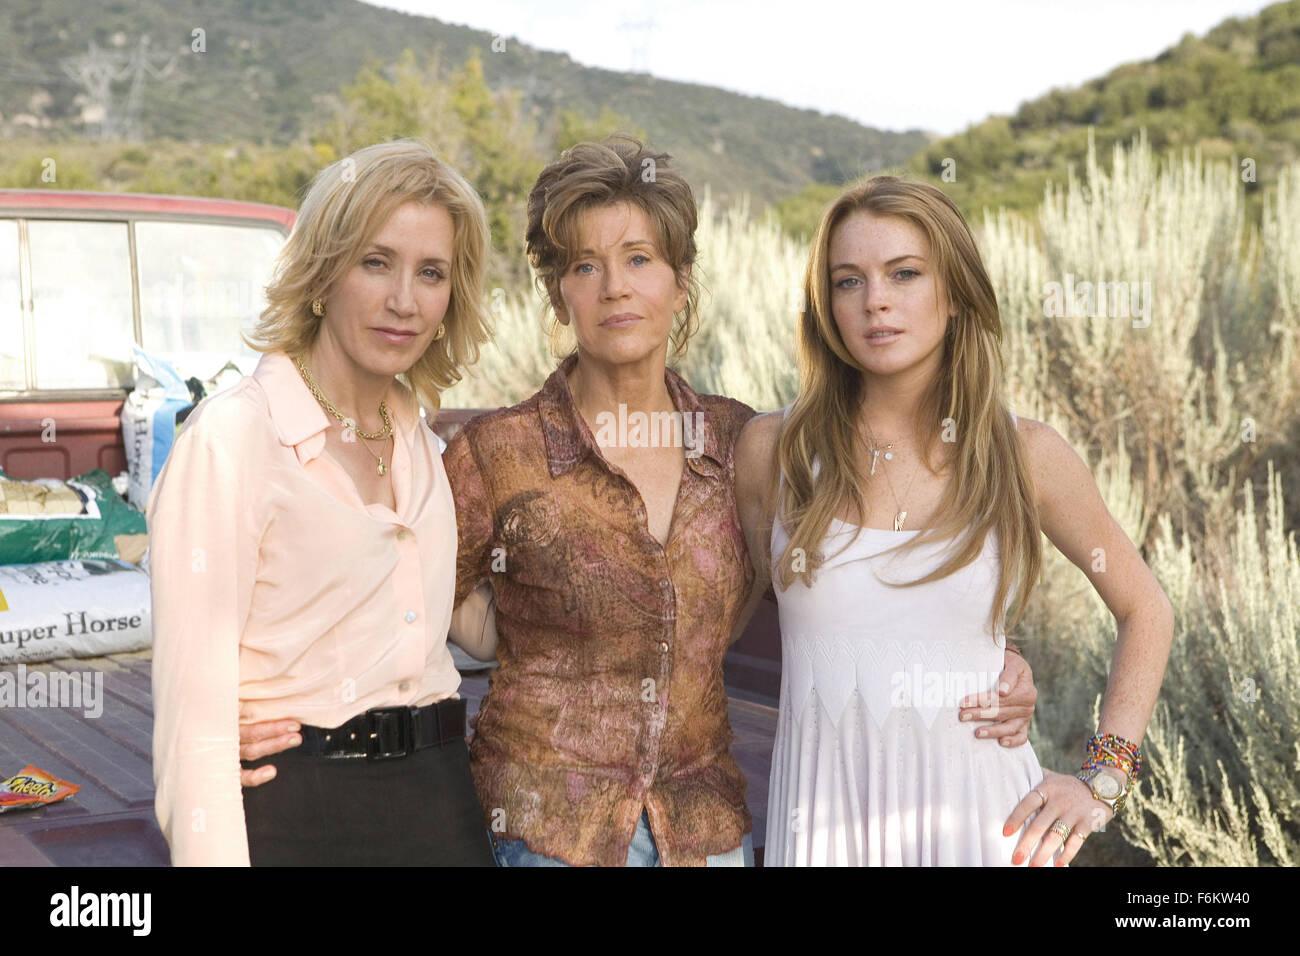 RELEASE DATE: 2007. STUDIO: Universal Studios. PLOT: Georgia Rule follows a rebellious, uncontrollable teenager - Stock Image